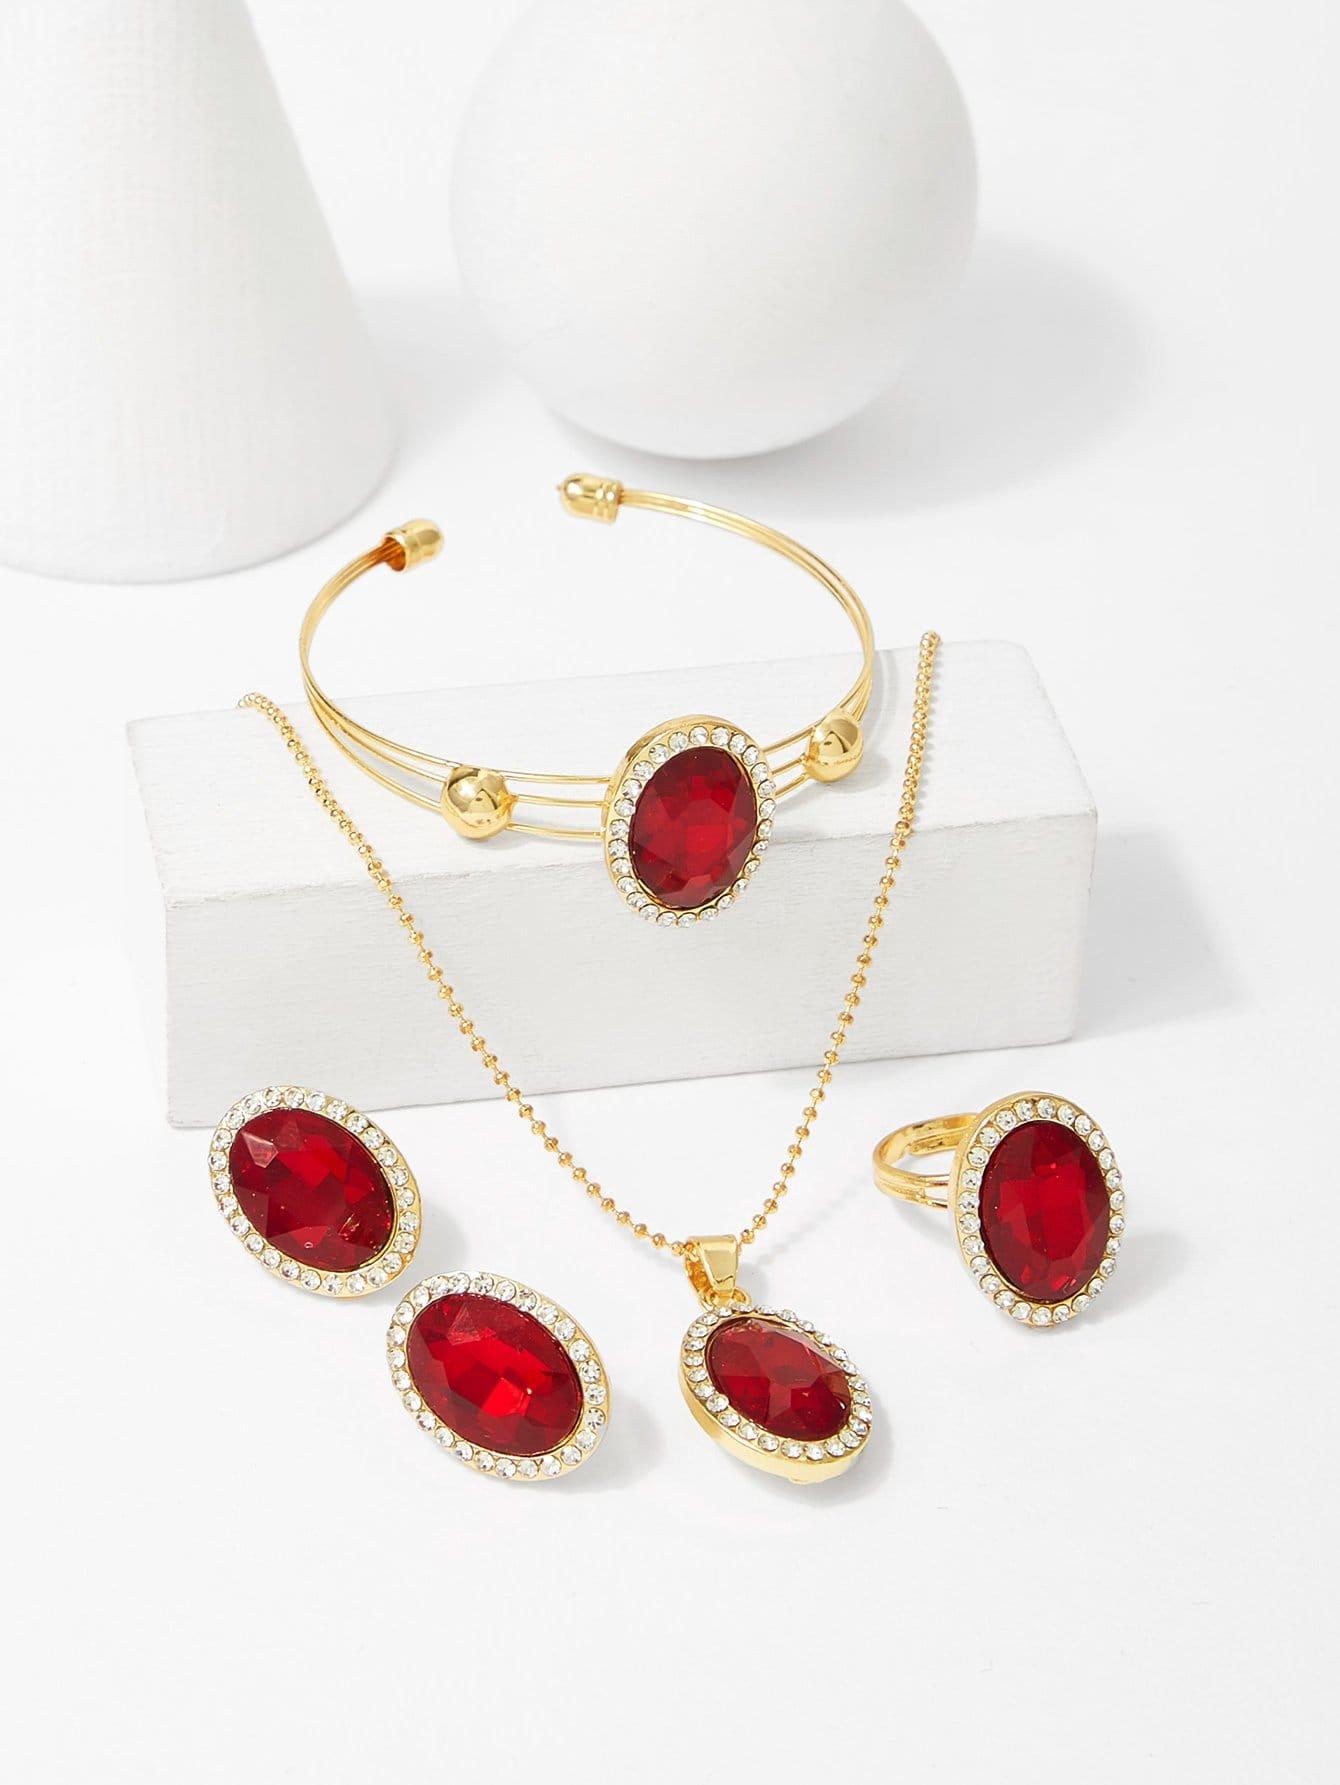 Edelstein Anhänger Halskette & Ohrringe & Armband & Ring